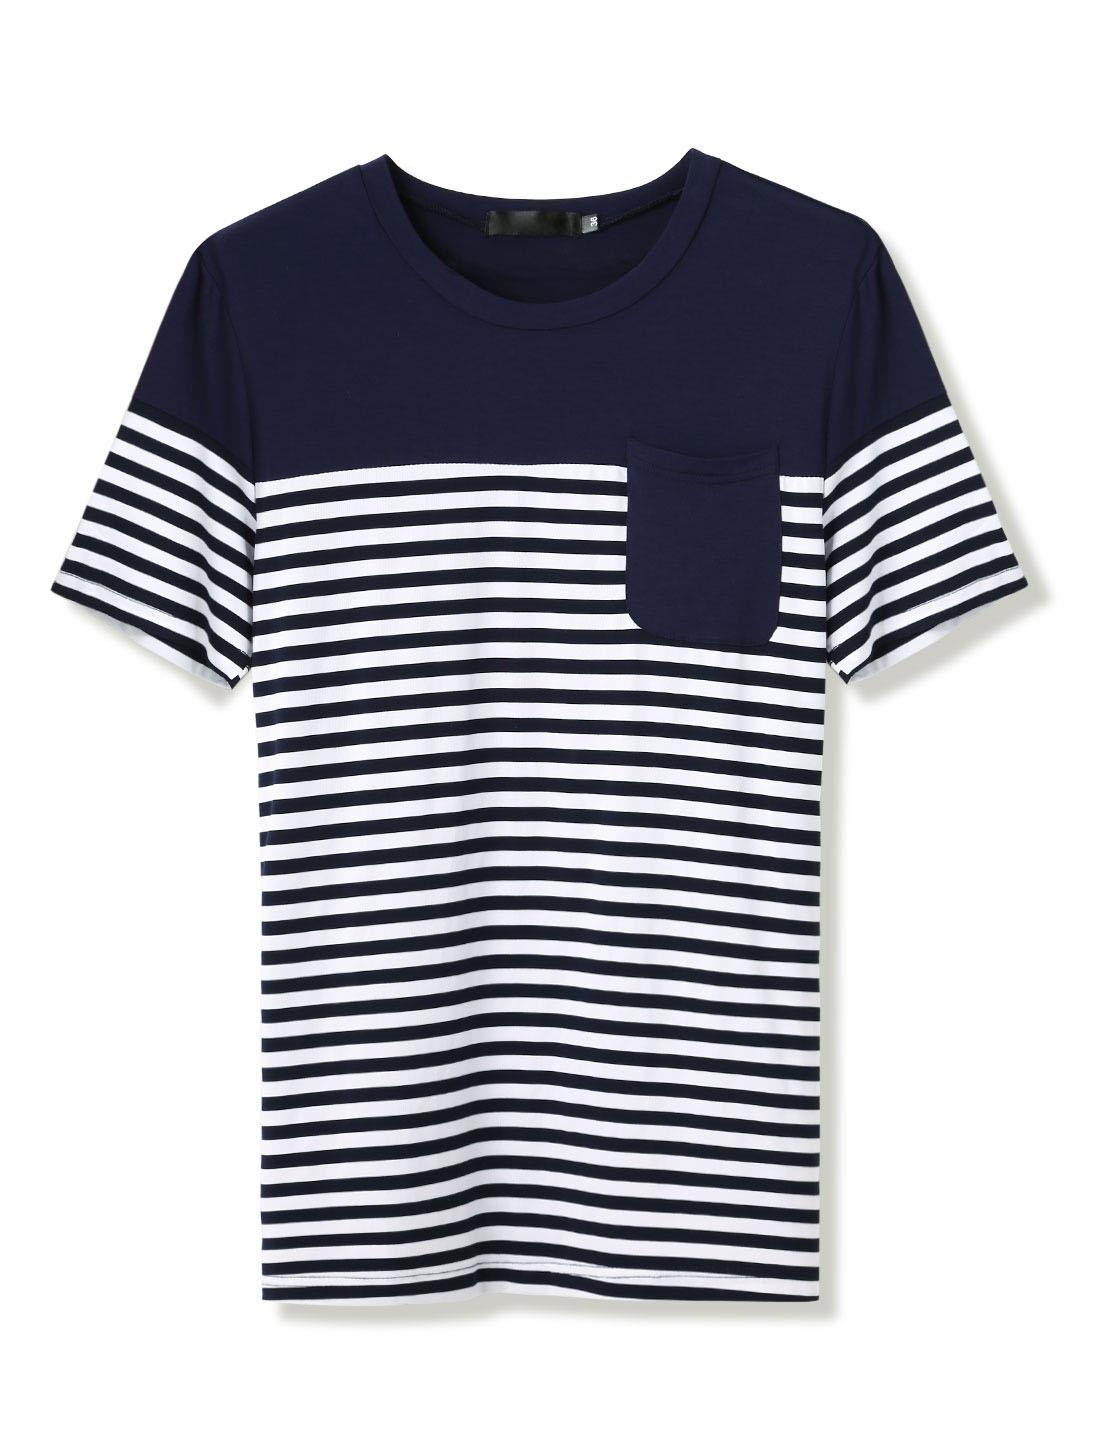 Men Round Neck Patch Pocket Striped Tee Navy Blue L